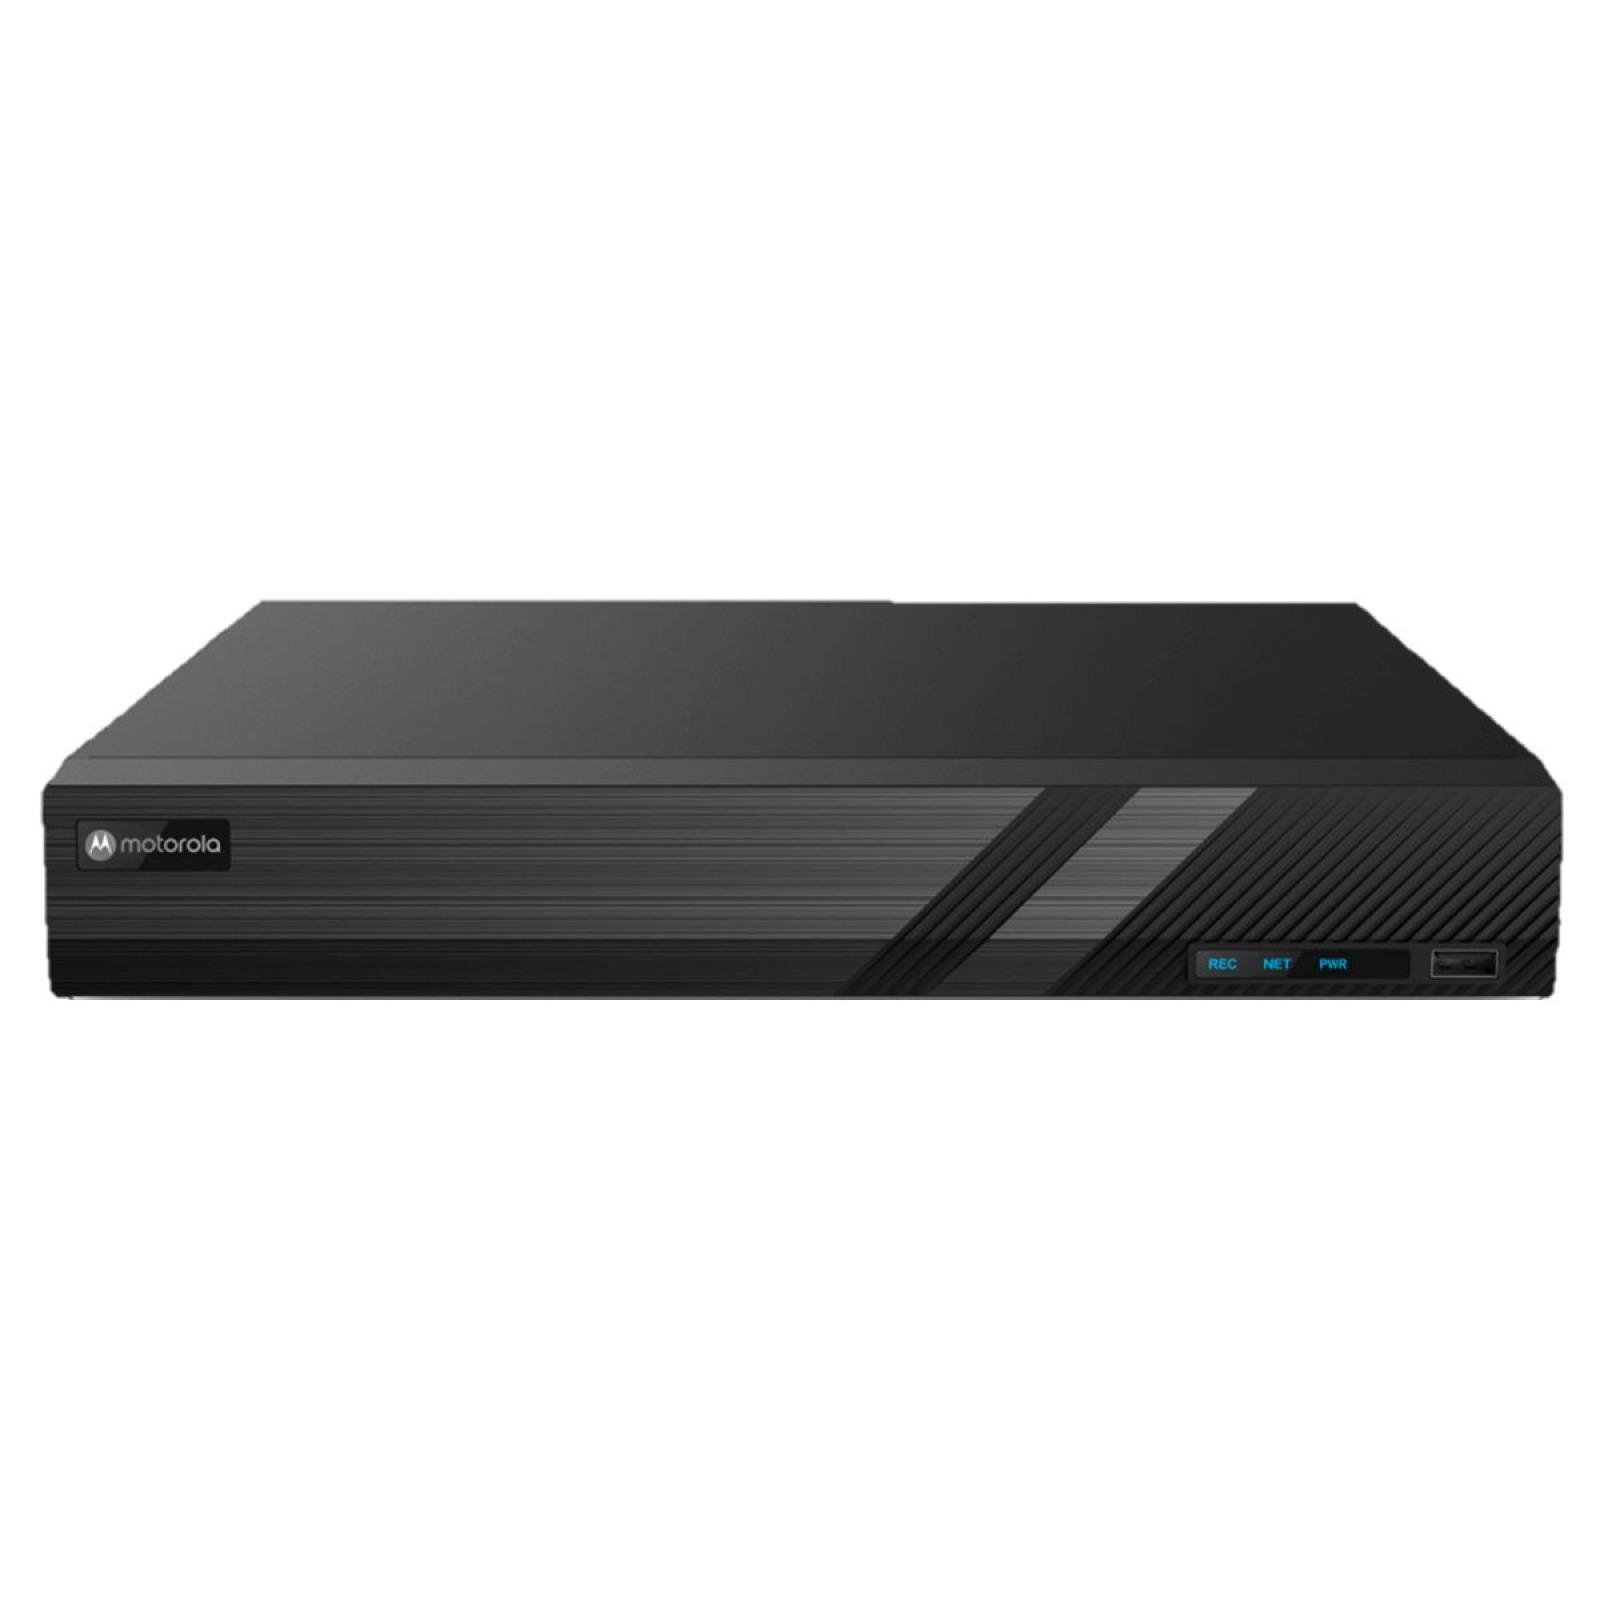 DVR FULL HD 4 CANAIS MOTOROLA MTD041F0011